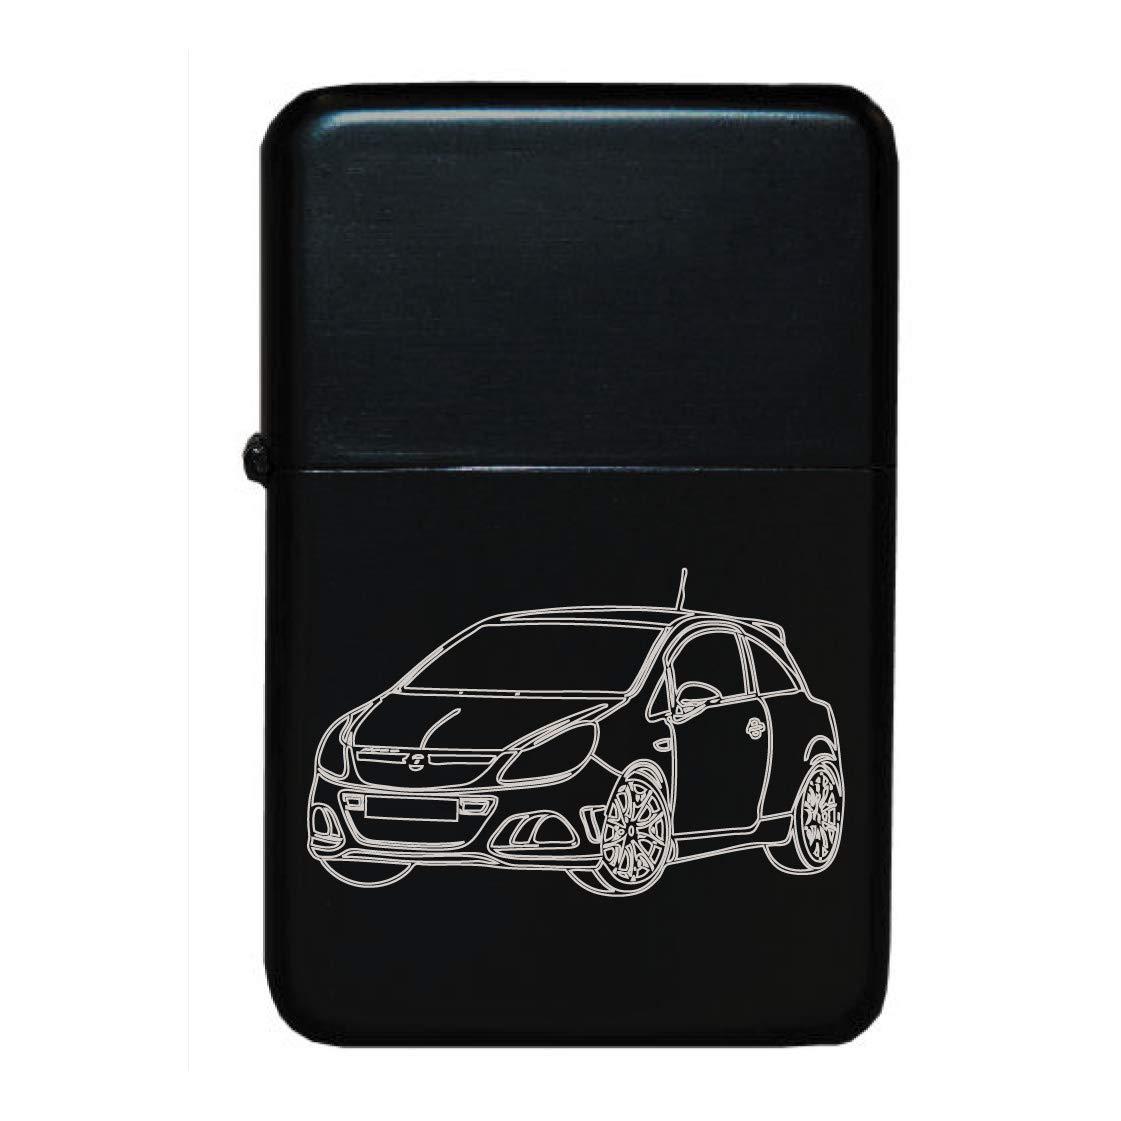 Notts Laserfeuerzeug Stern Opel Corsa OPC Star Lighter